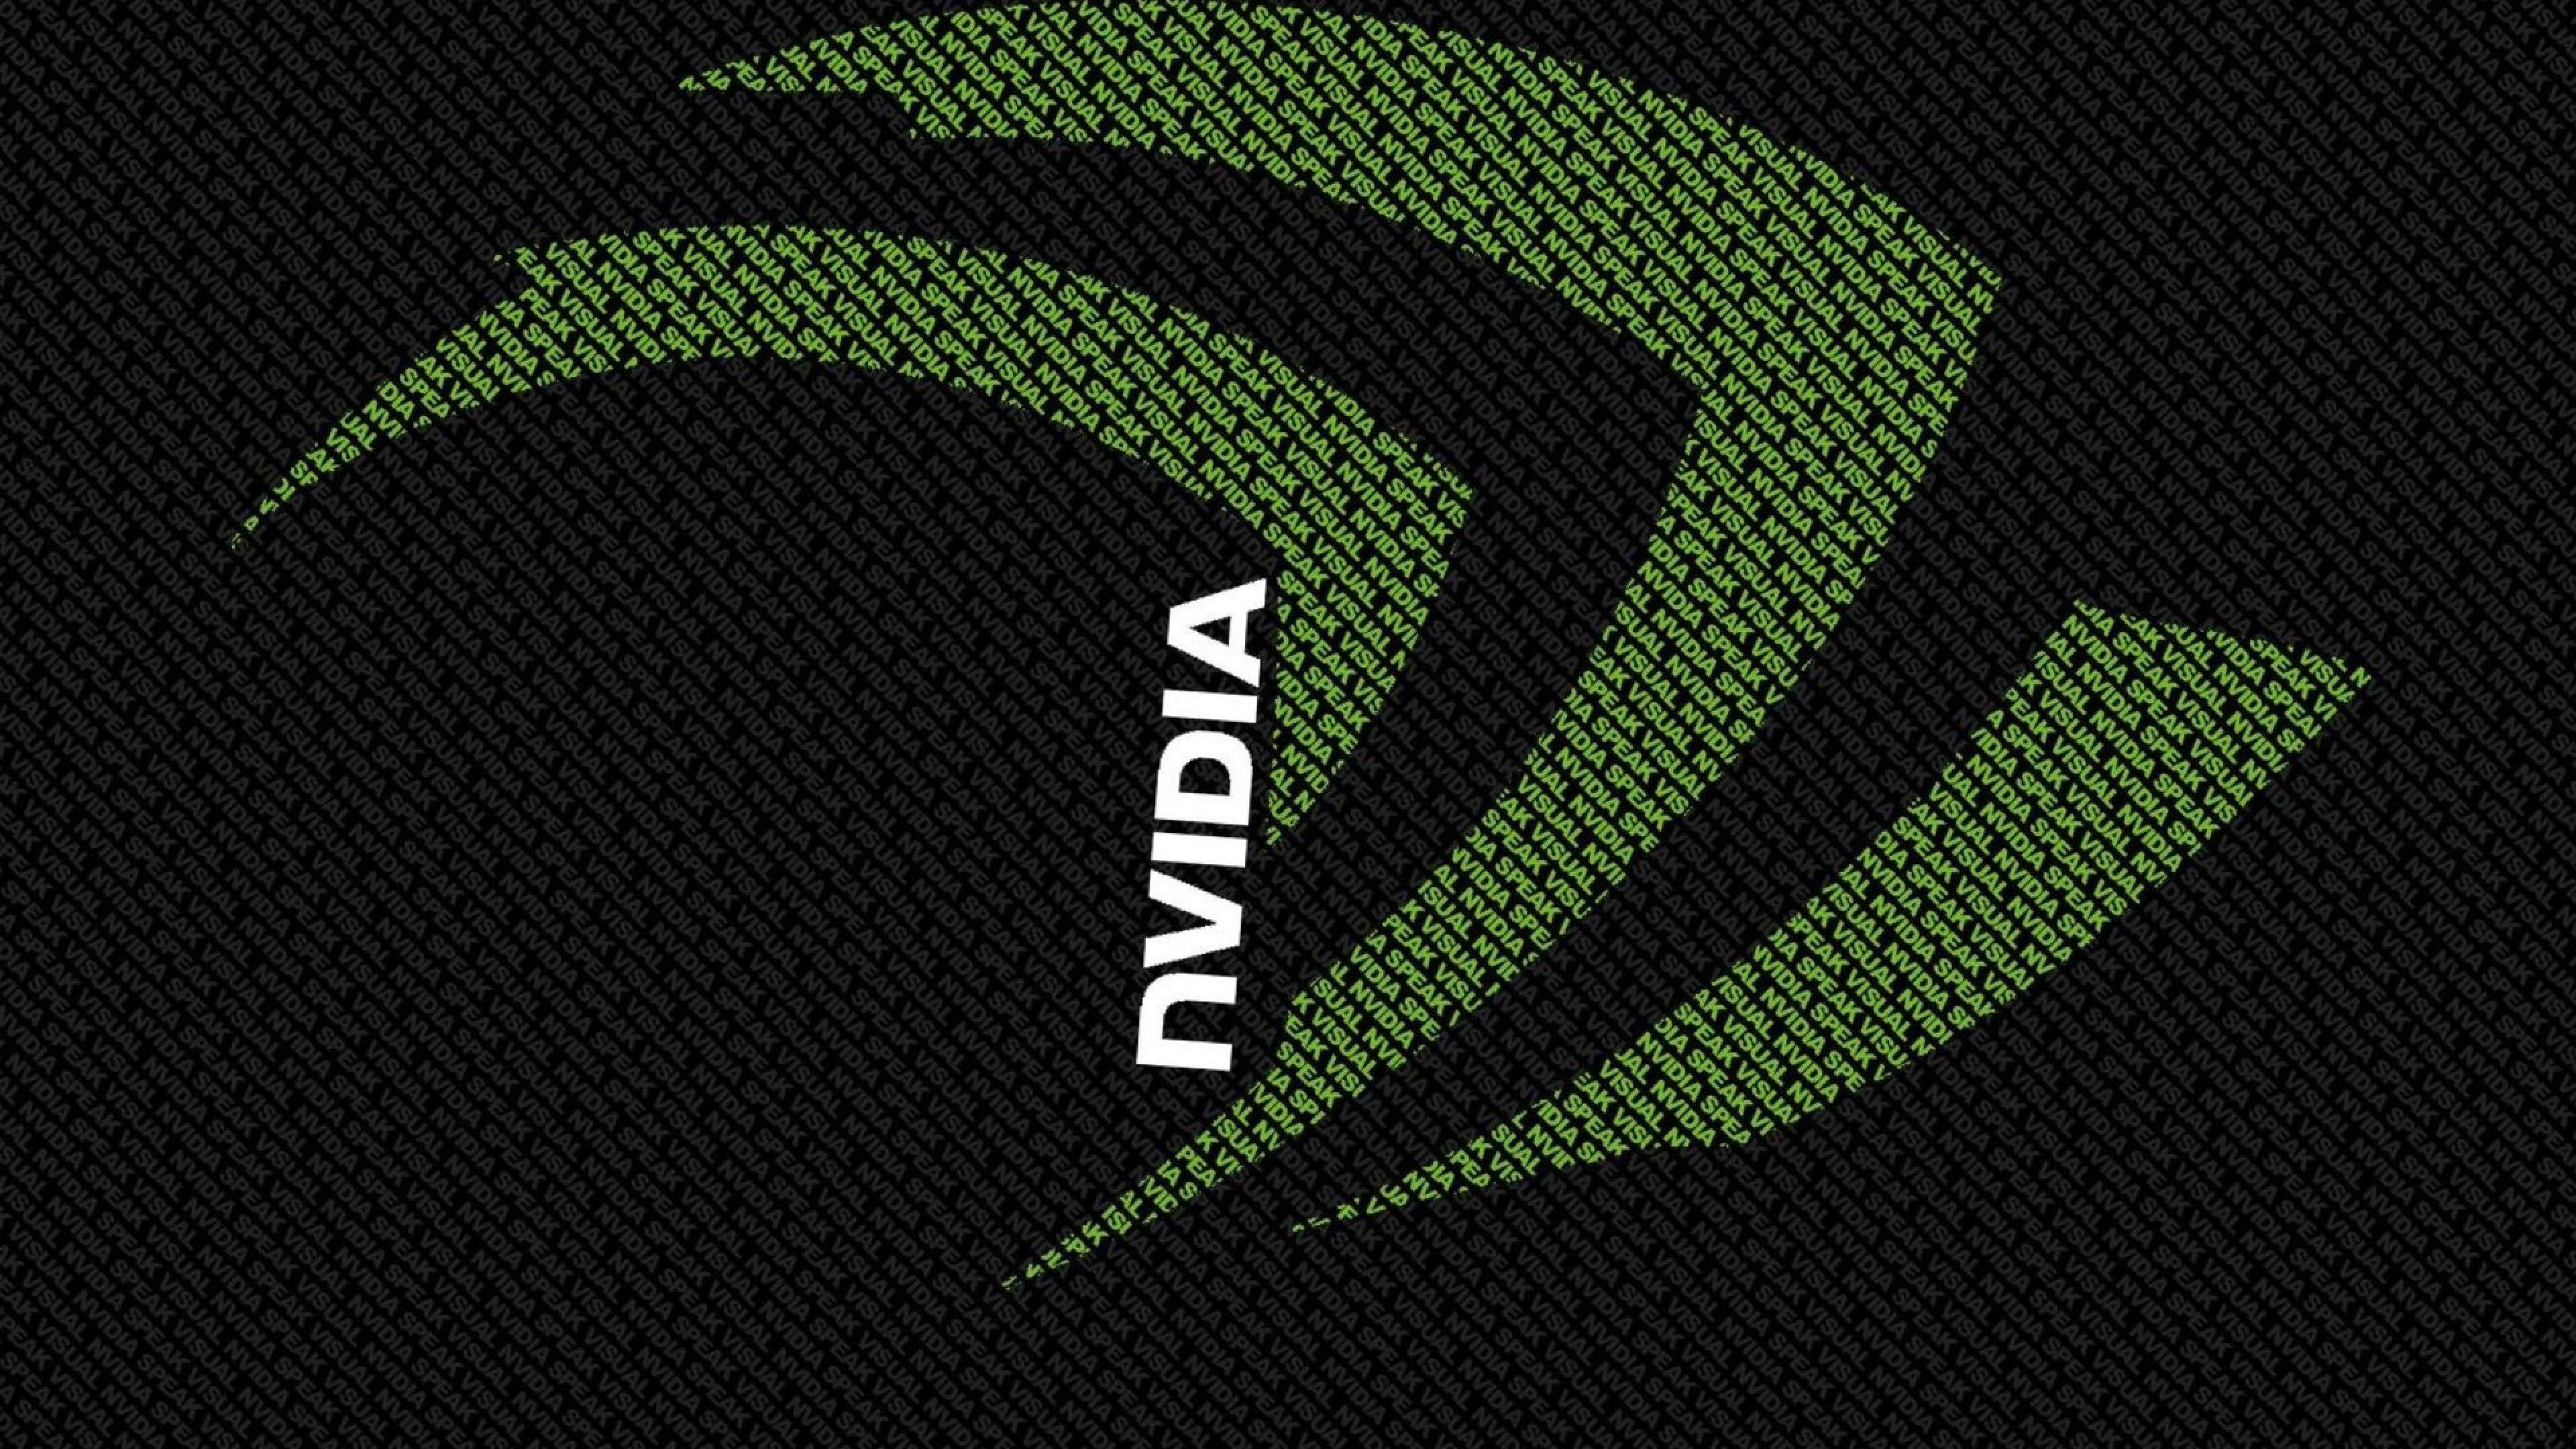 Nvidia 4k Desktop Wallpapers Top Free Nvidia 4k Desktop Backgrounds Wallpaperaccess